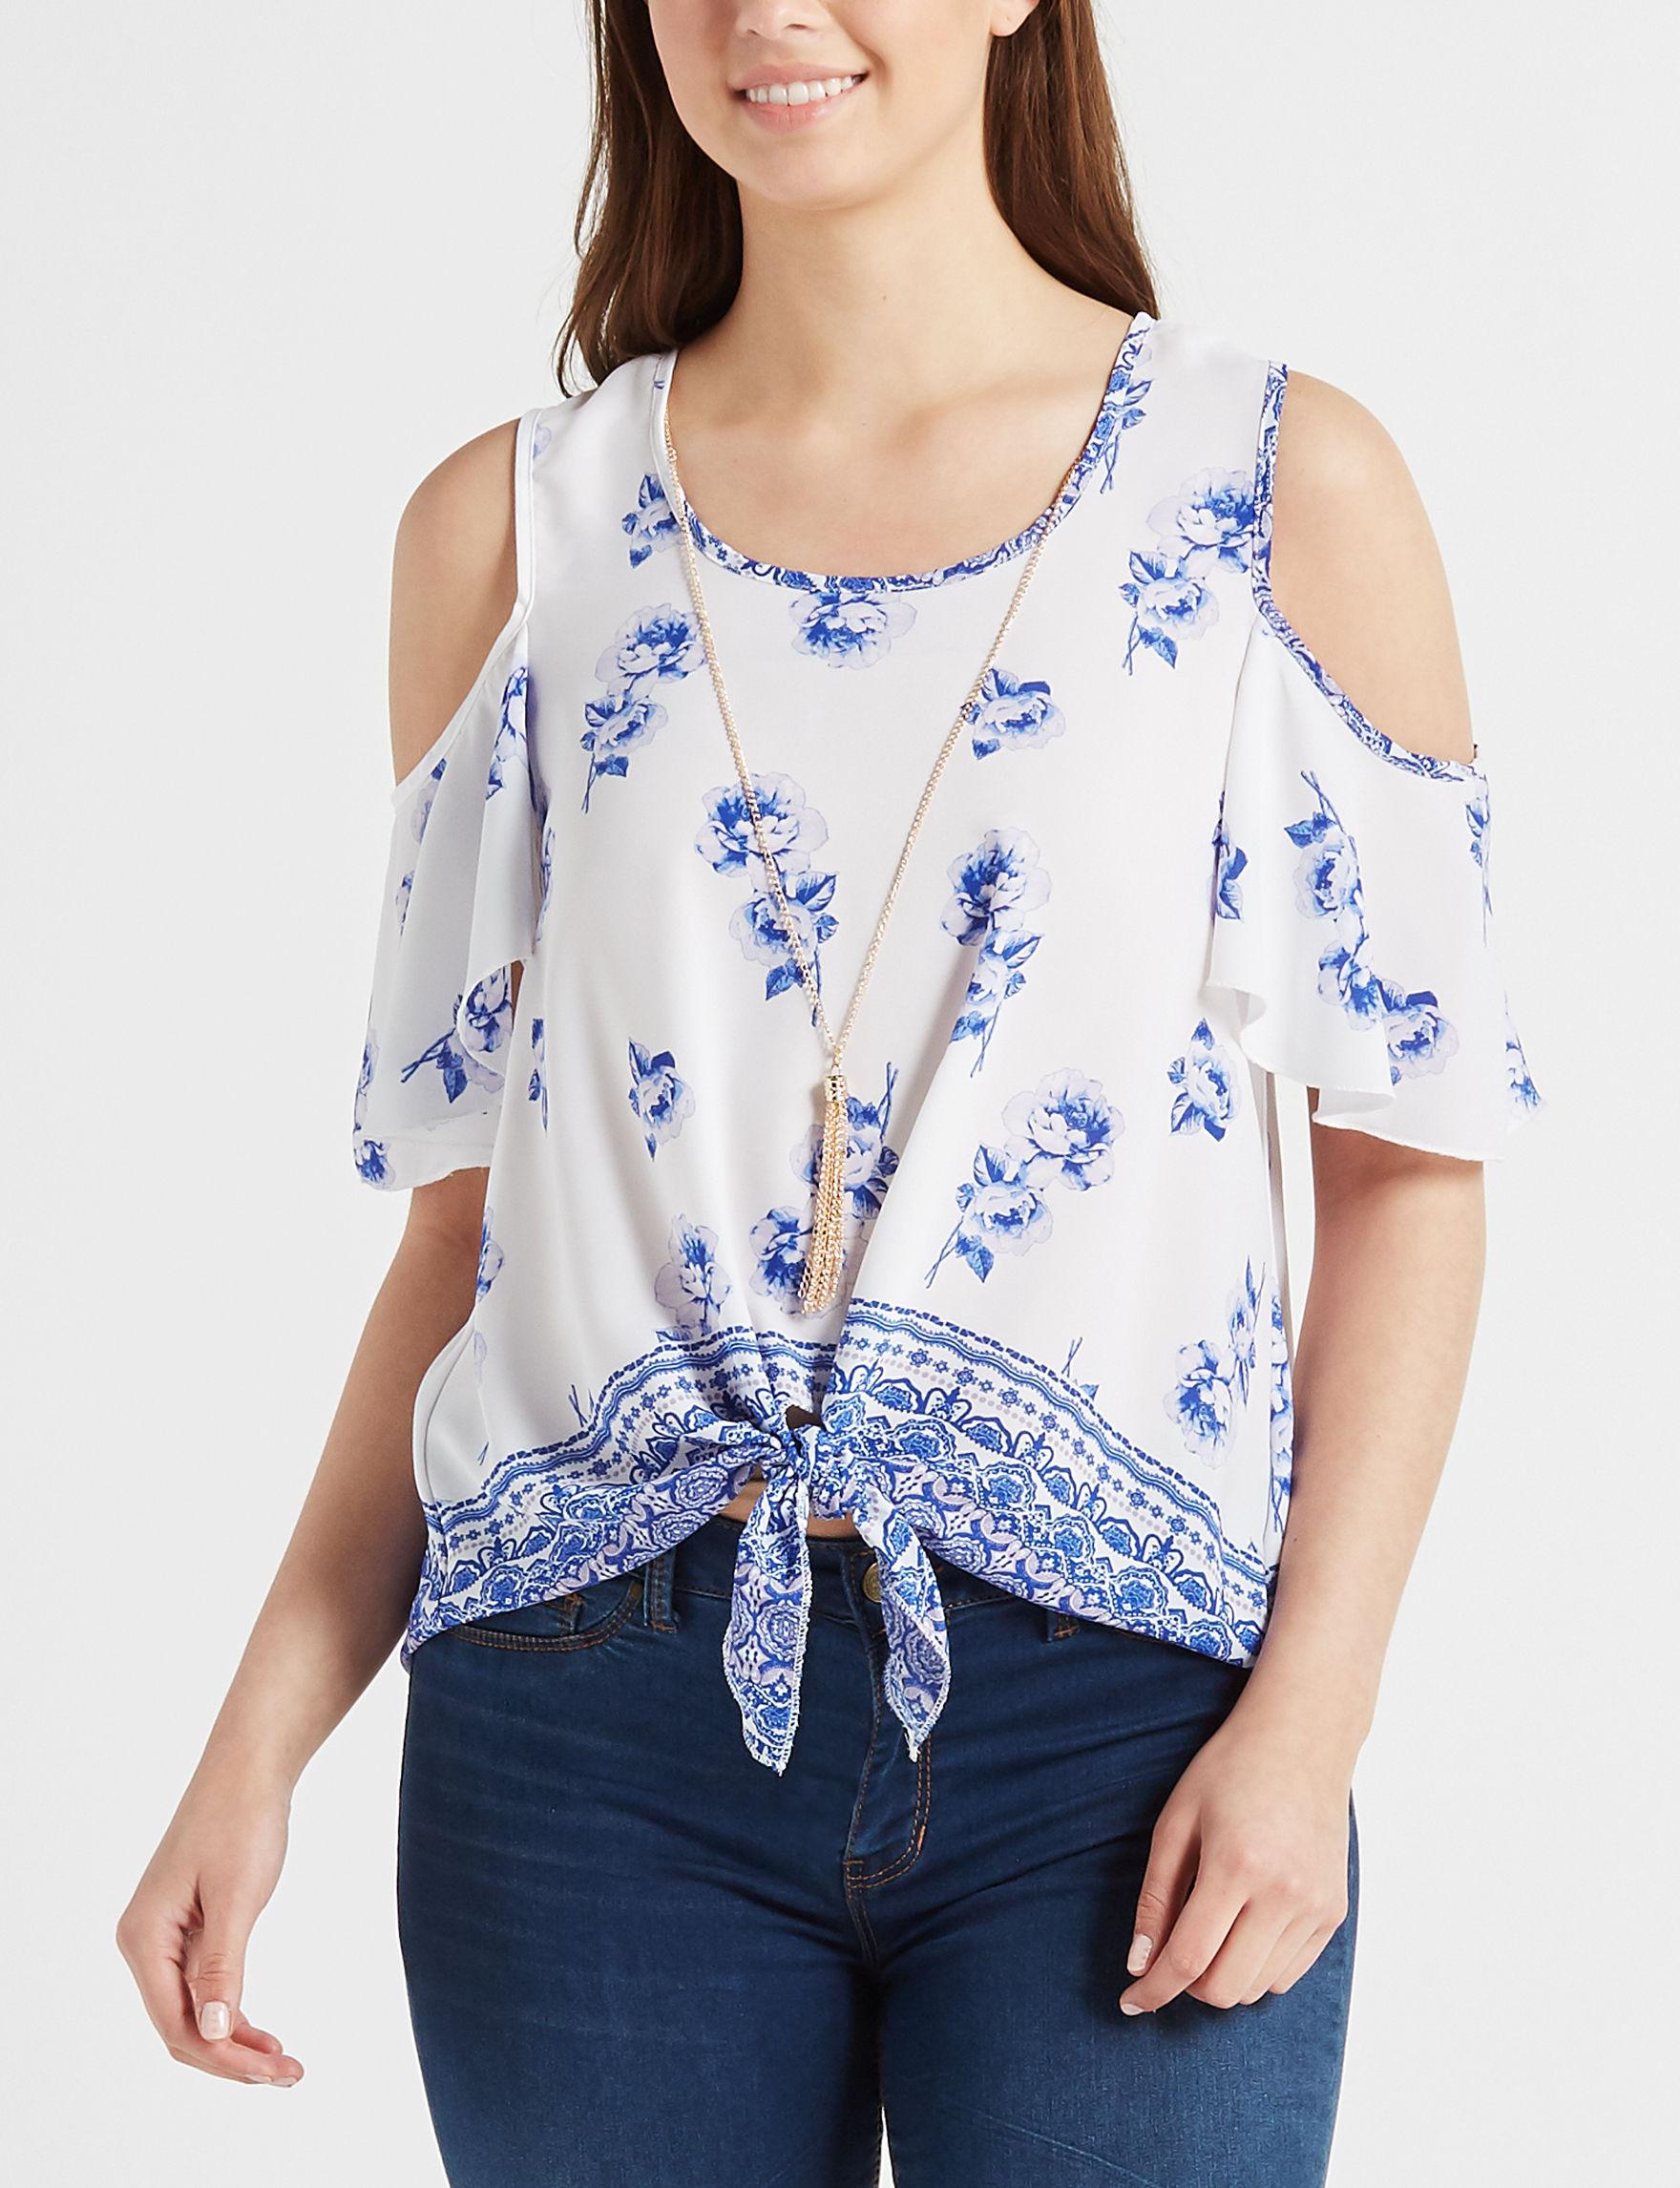 Wishful Park White / Blue Shirts & Blouses